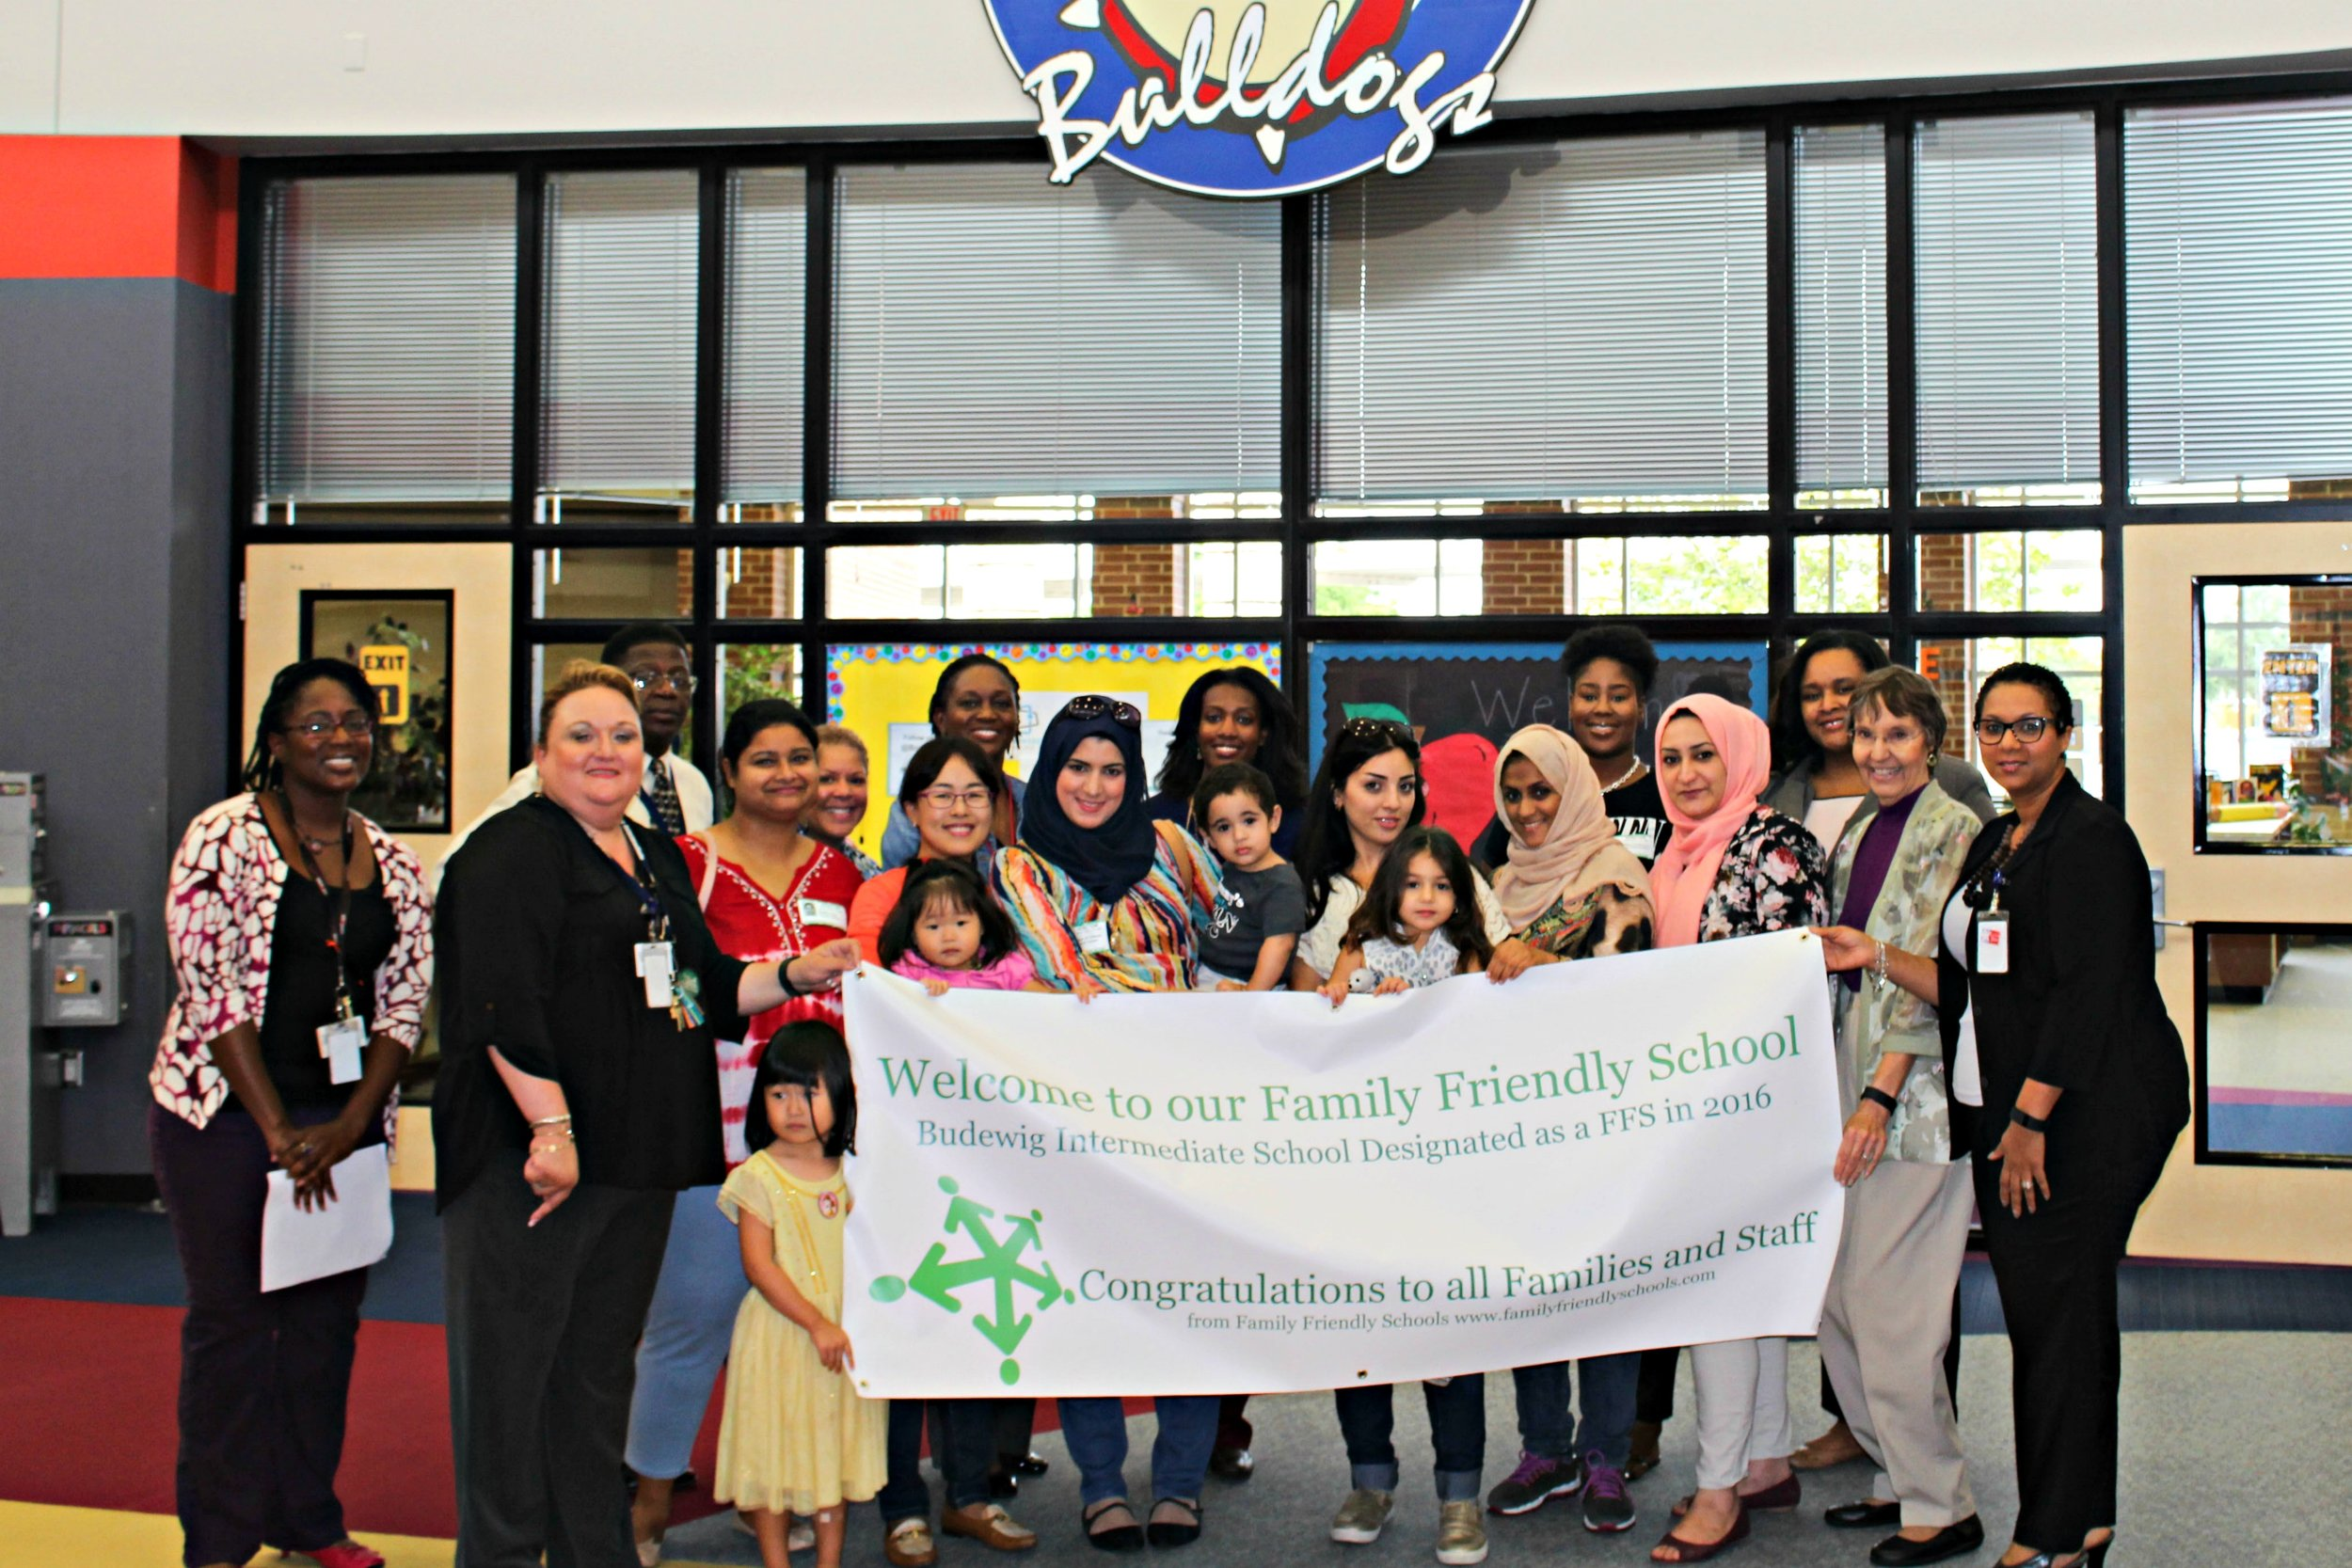 Budewig Intermediate School, Alief ISD, Houston, TX